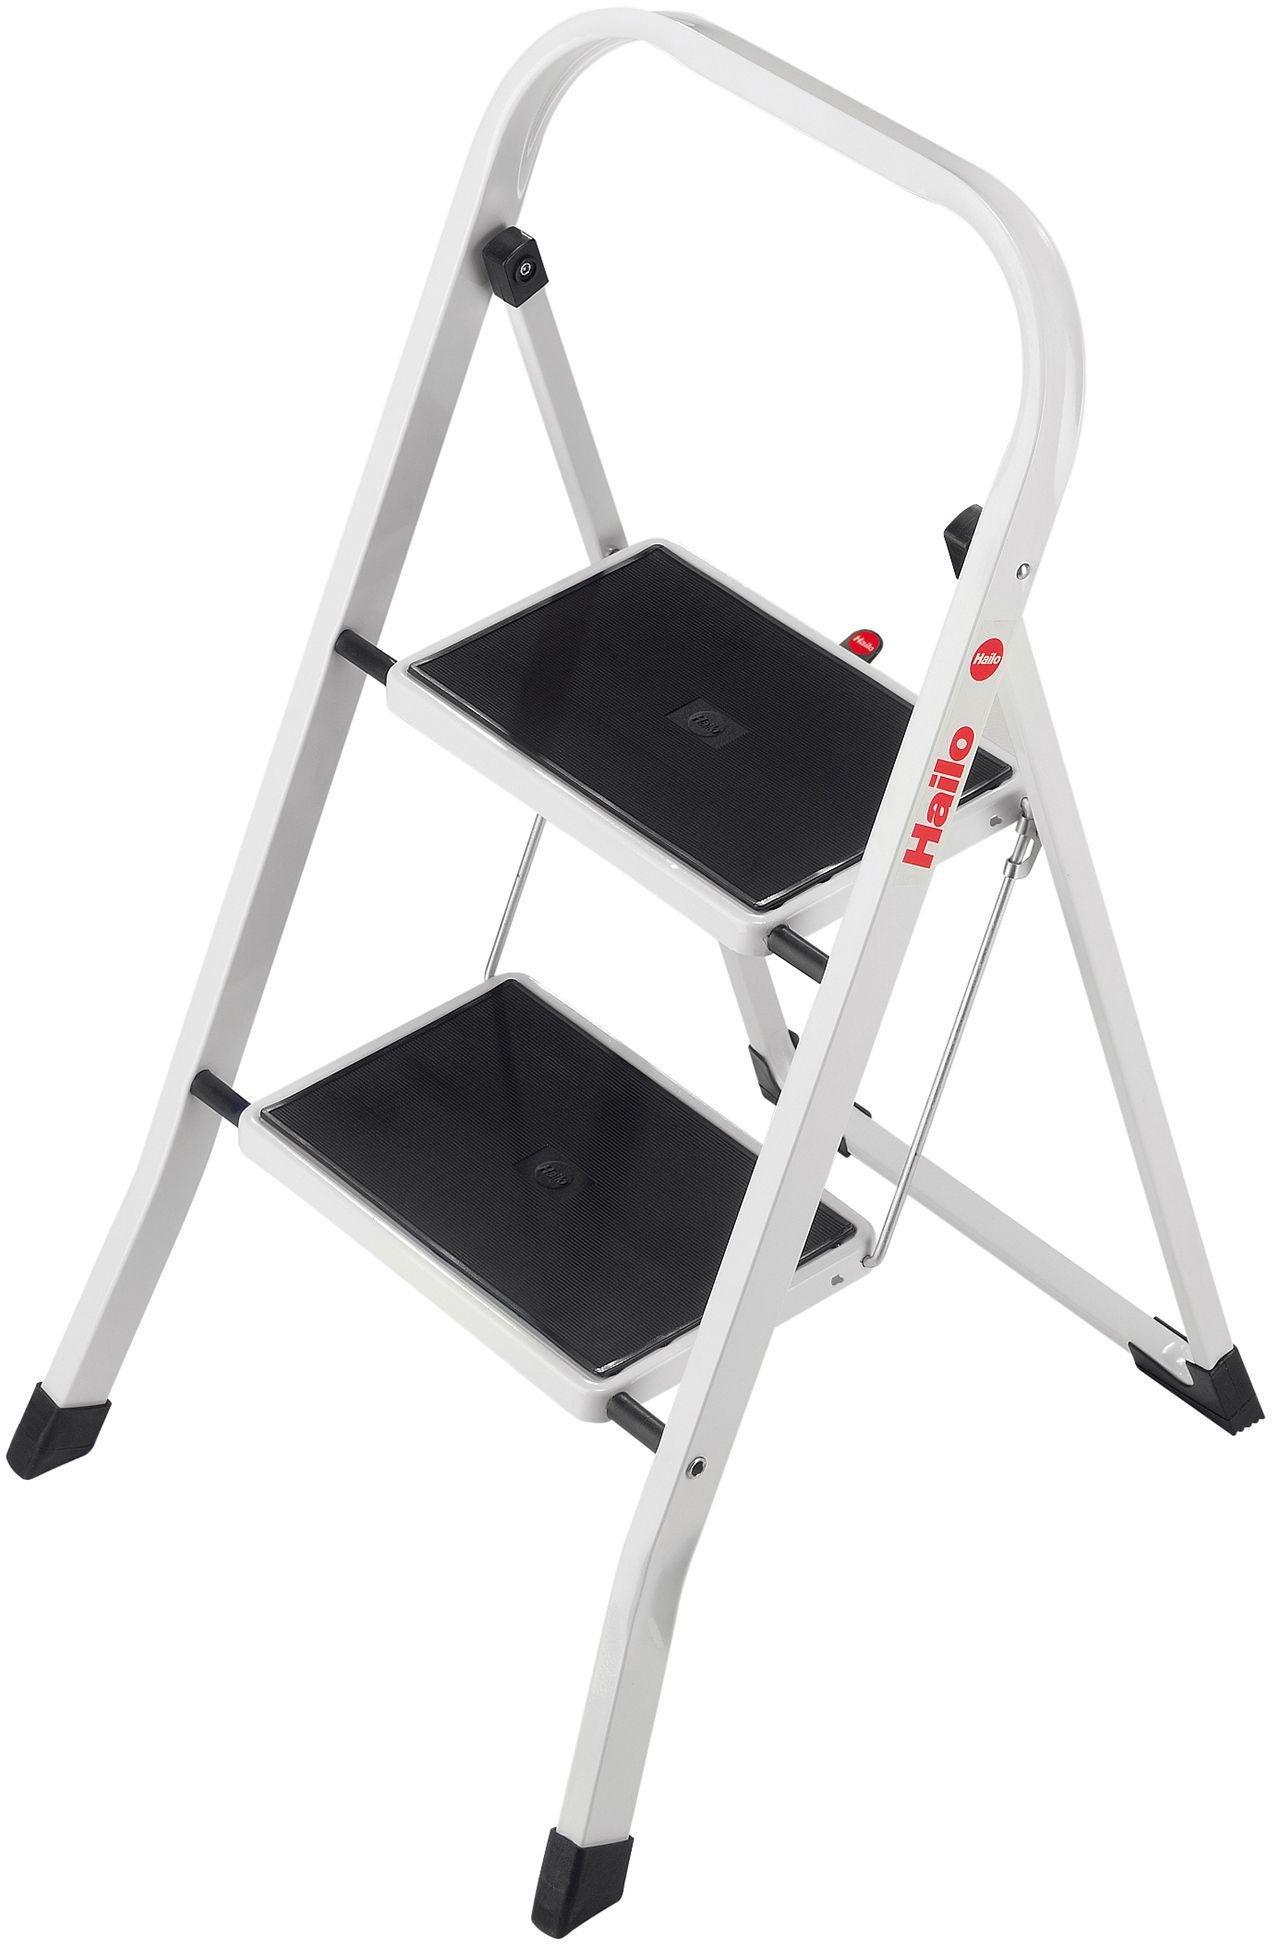 Hailo - 2 Tread K20 Step Stool lowest price